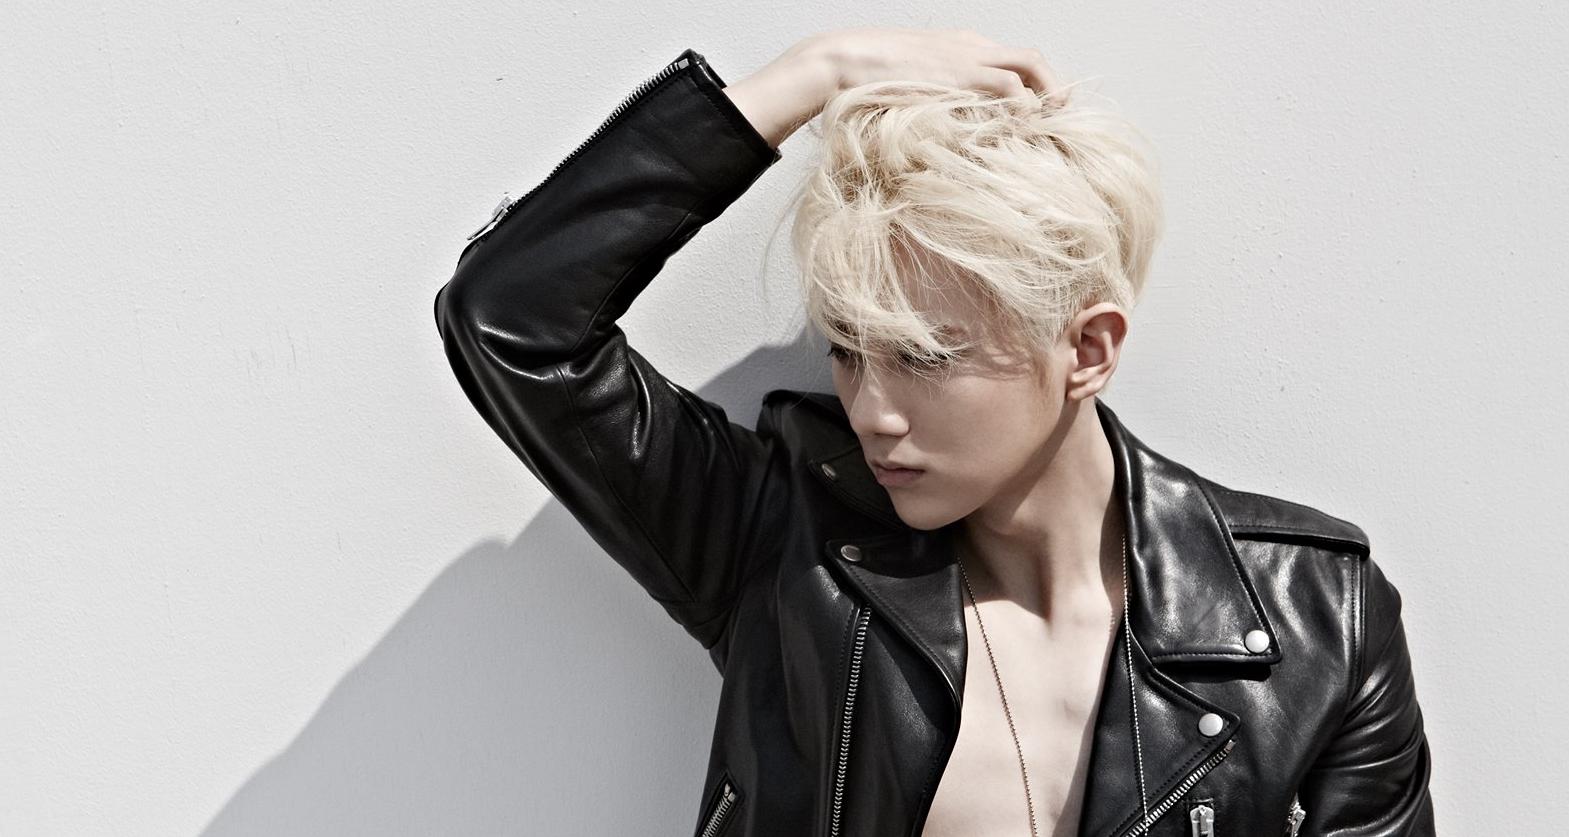 Manwhore Hyunseung 4